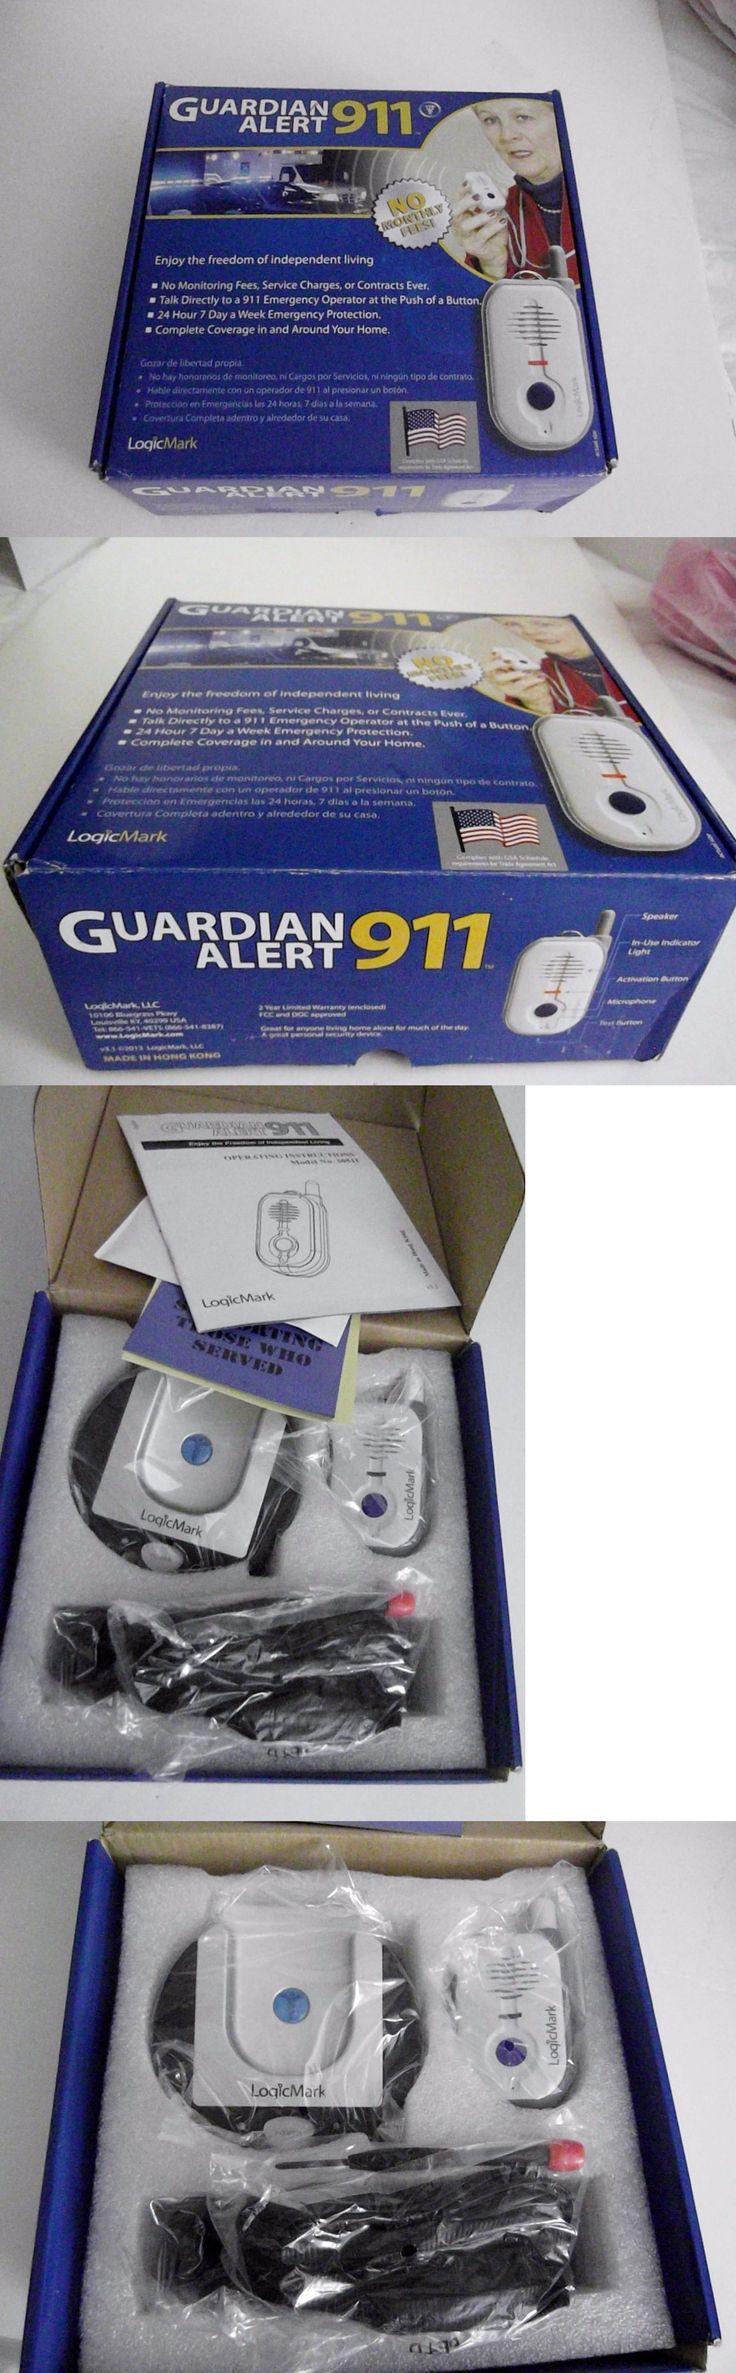 Emergency Alert Systems: Logicmark Guardian Alert 911 Emergency Alert System - No Monthly Fees *New* -> BUY IT NOW ONLY: $79 on eBay!